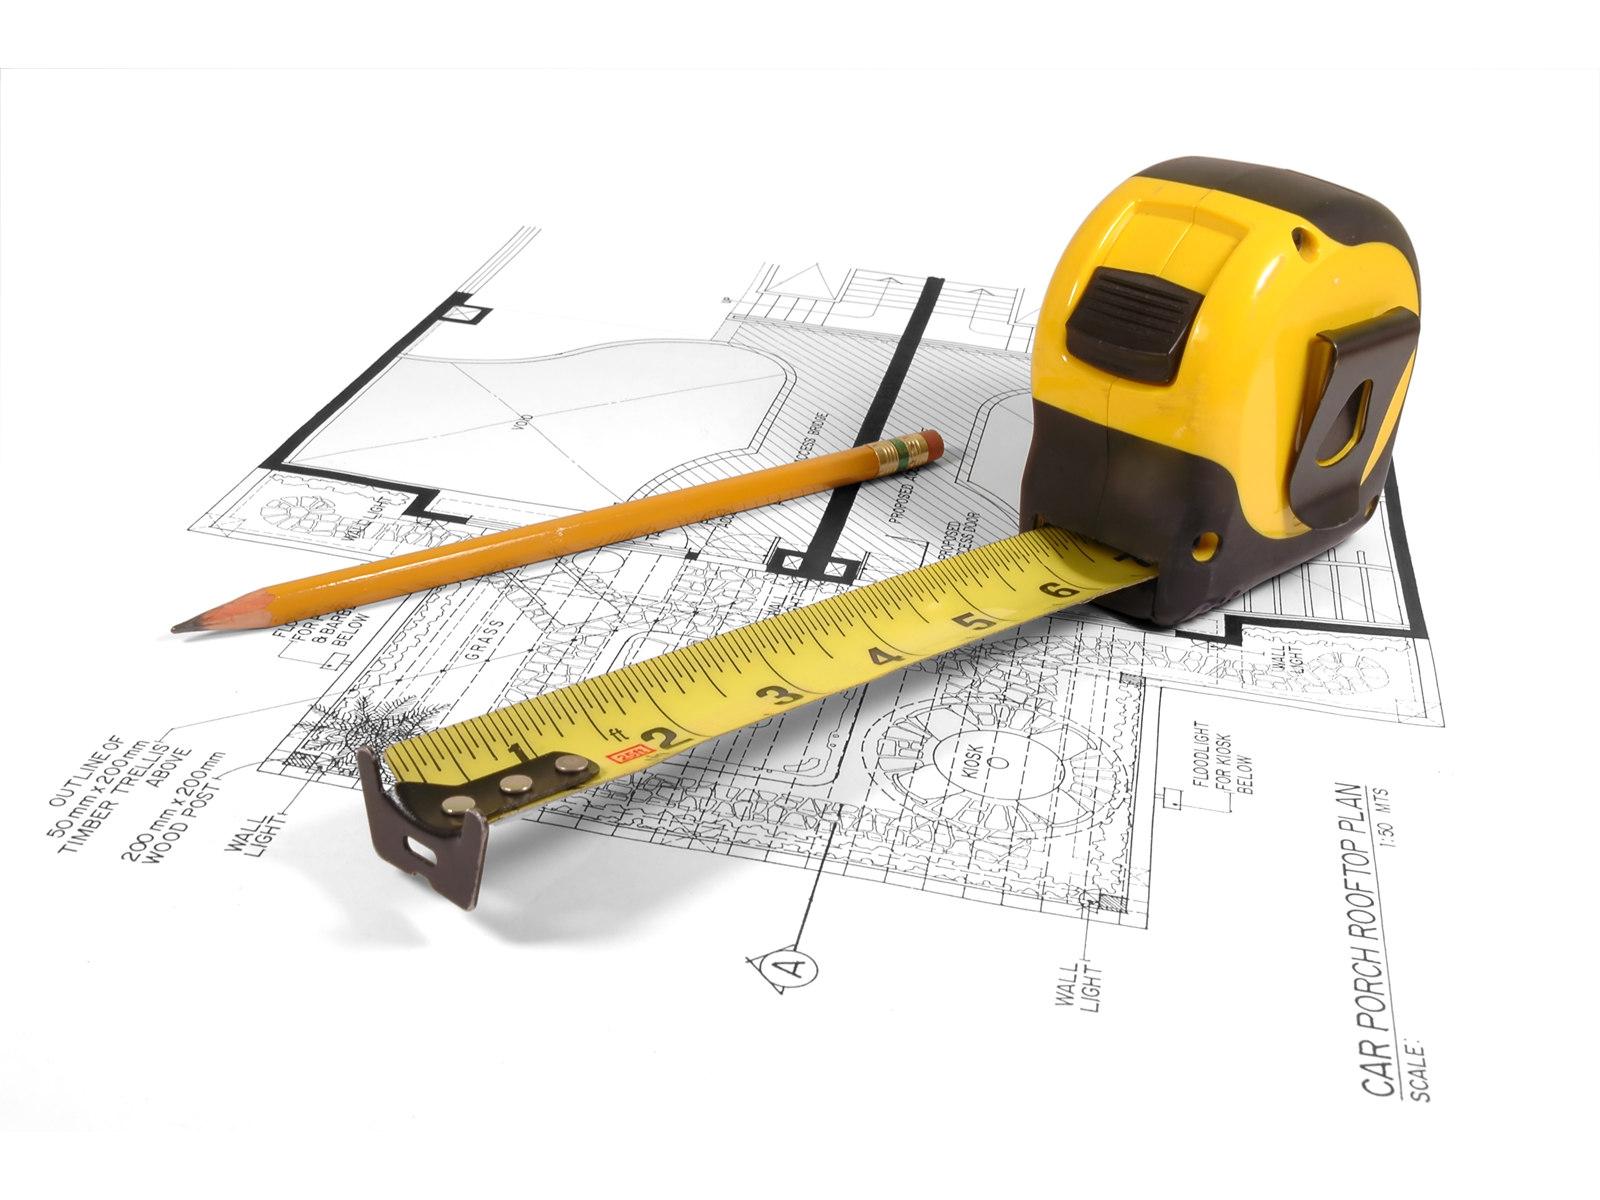 Engineering Wallpaper; Engineering Wallpaper; Engineering Wallpaper ...